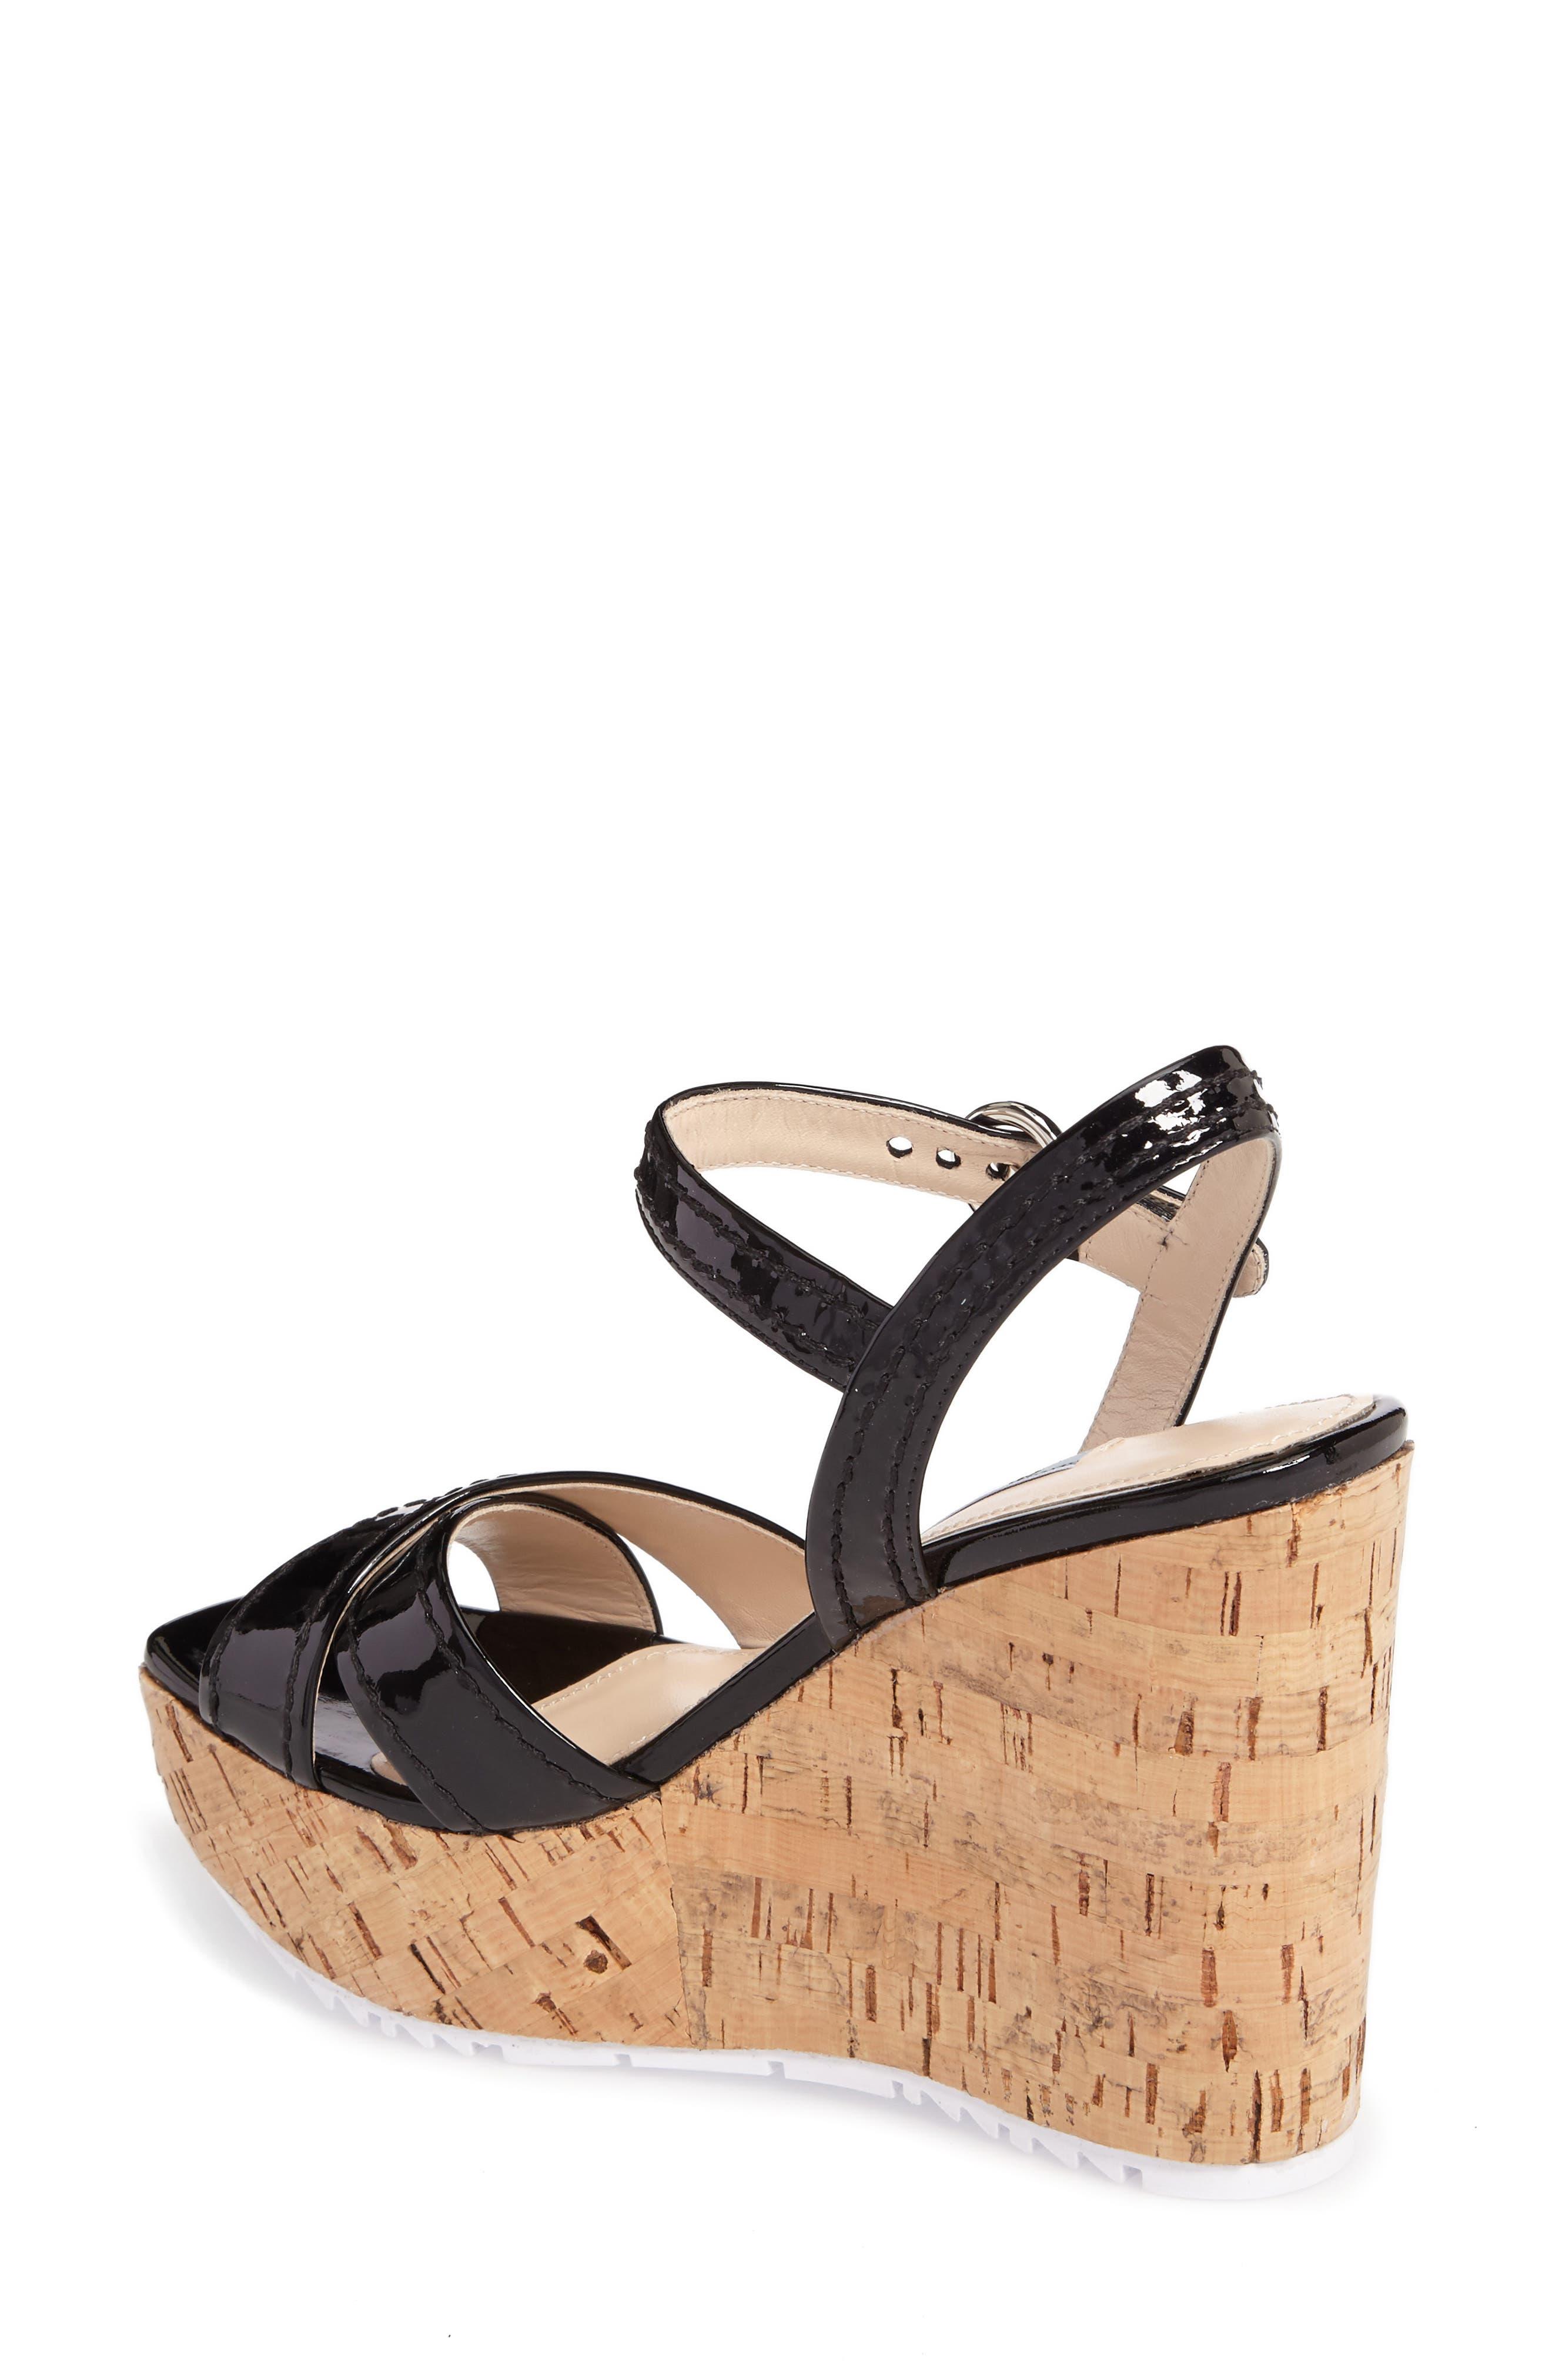 Cork Wedge Sandal,                             Alternate thumbnail 2, color,                             Black